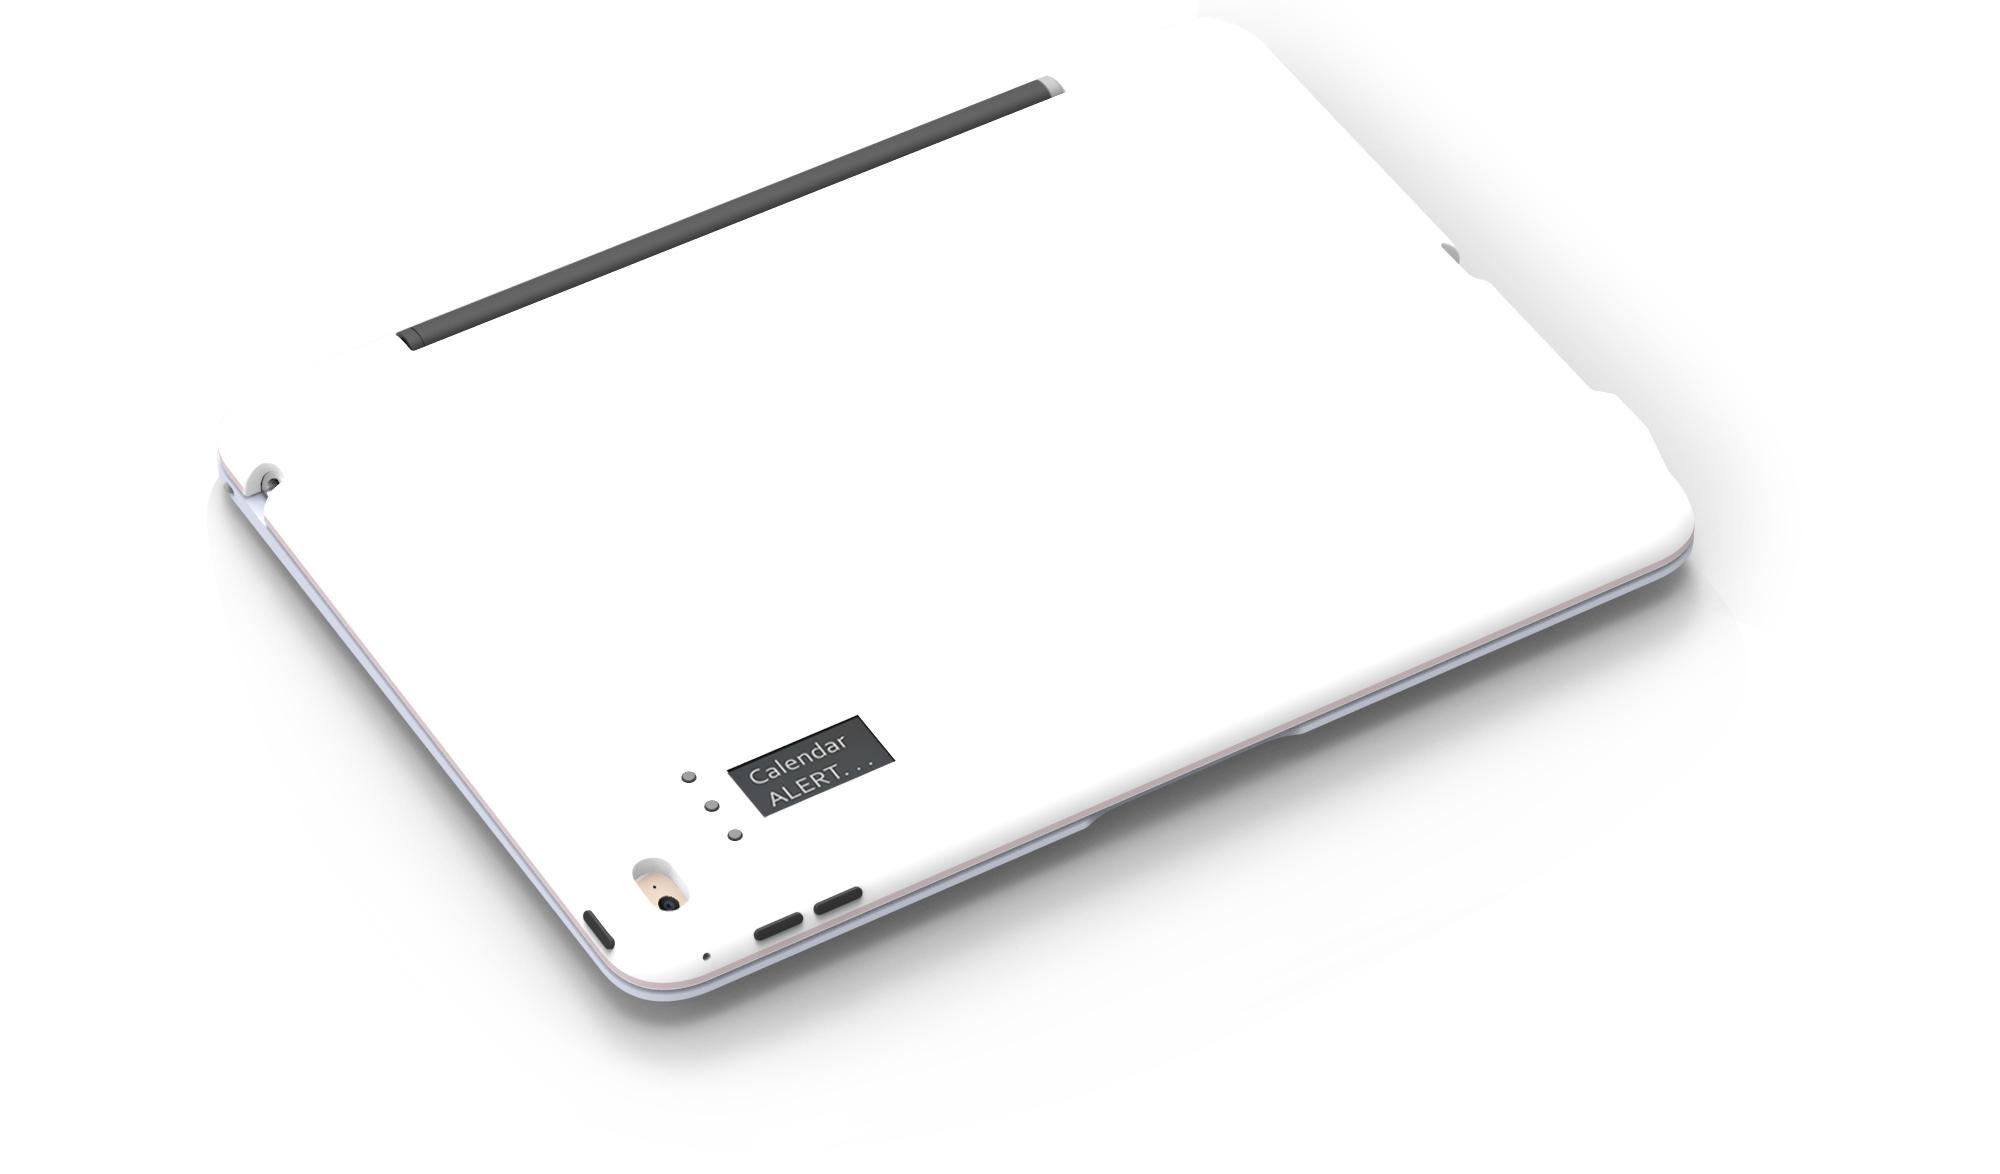 super popular 40f87 dbdc8 Incipio debuts ClamCase keyboards for iPad Pro, mini 4 + Air 2, adds ...